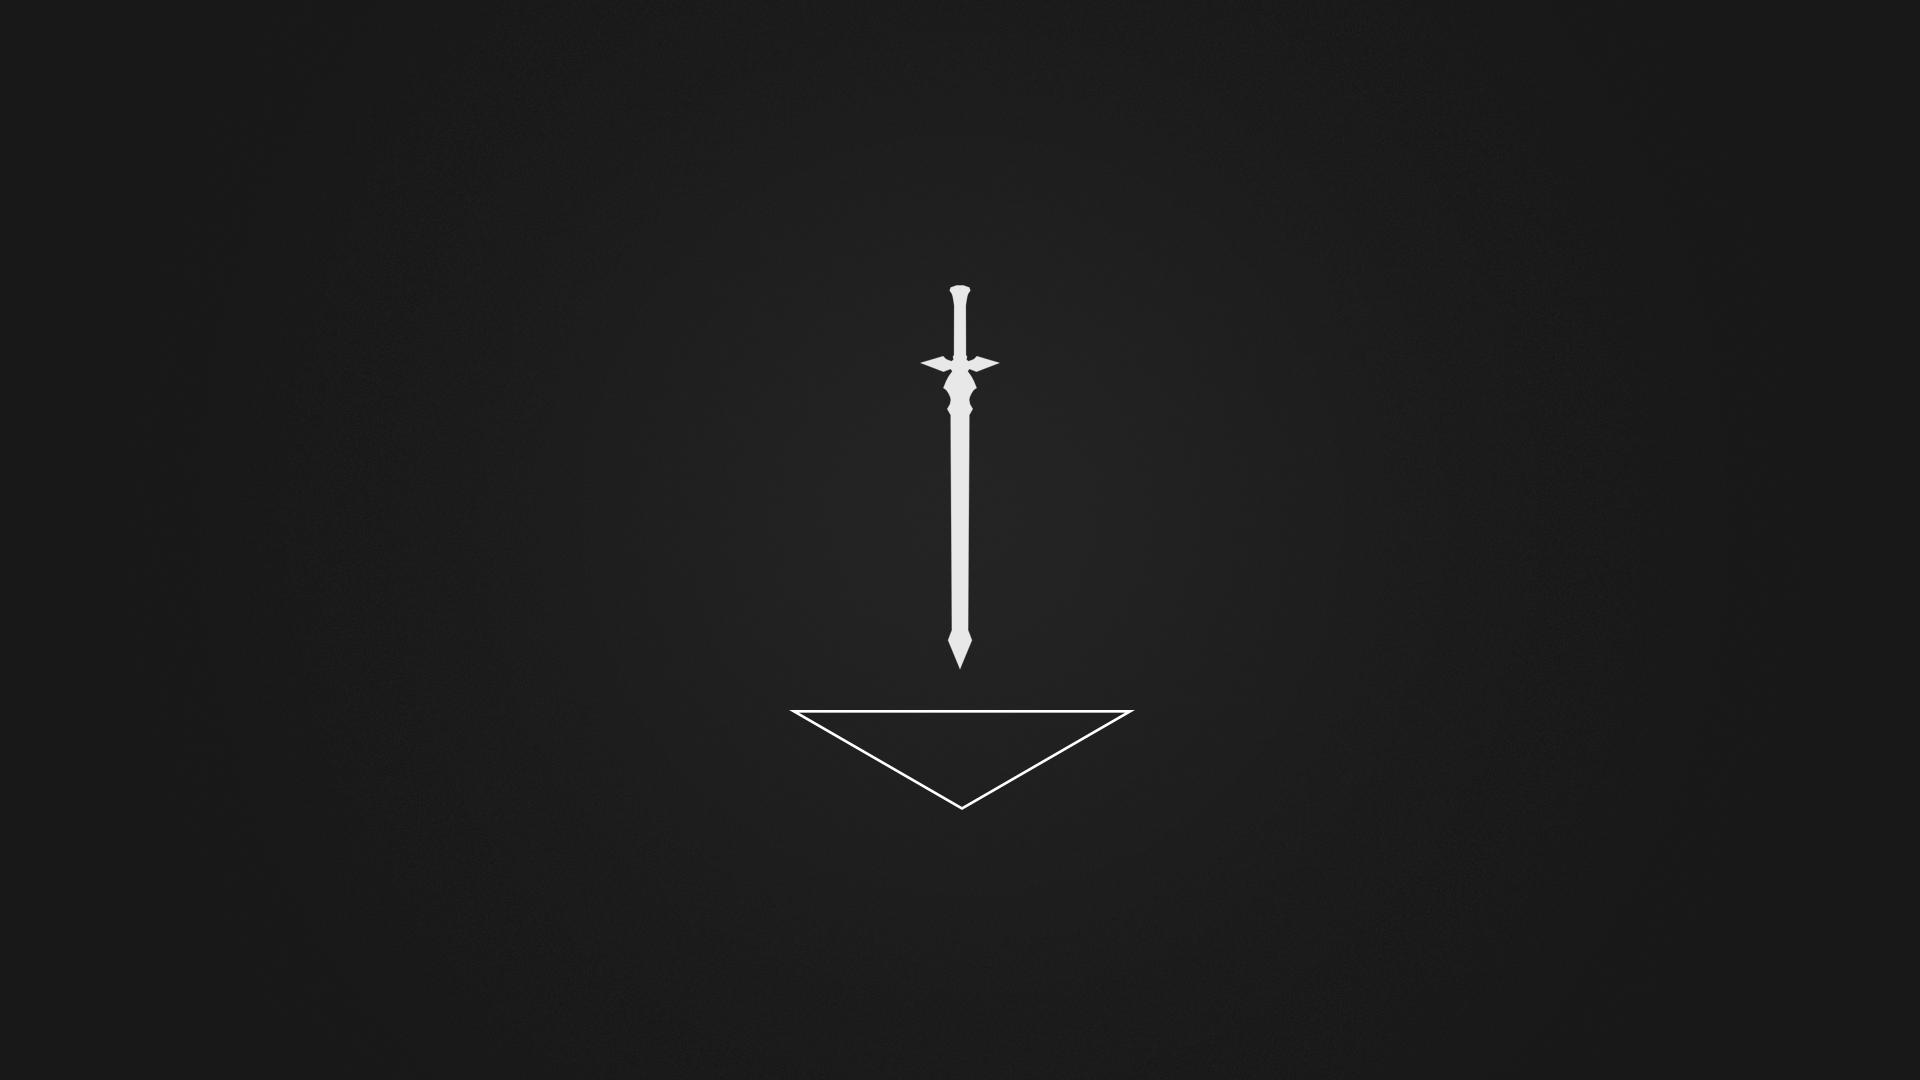 Best Wallpaper Black And White Minimalist - white-black-anime-minimalism-weapon-logo-sword-lighting-line-screenshot-computer-wallpaper-14124  Perfect Image Reference_654662.png